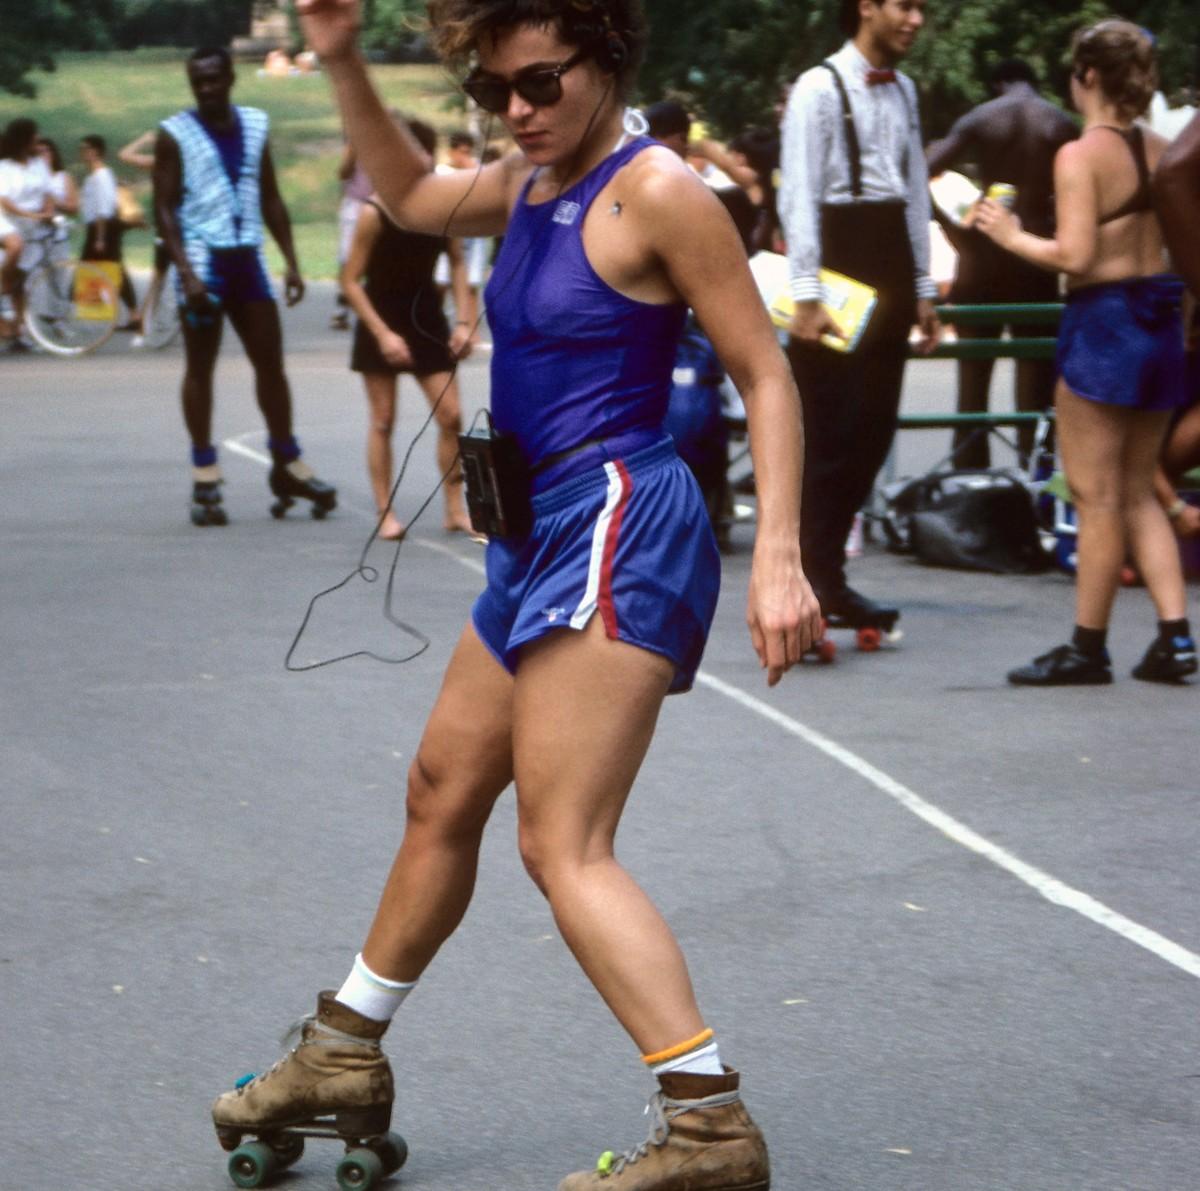 rollerskater-listening-to-her-walkman